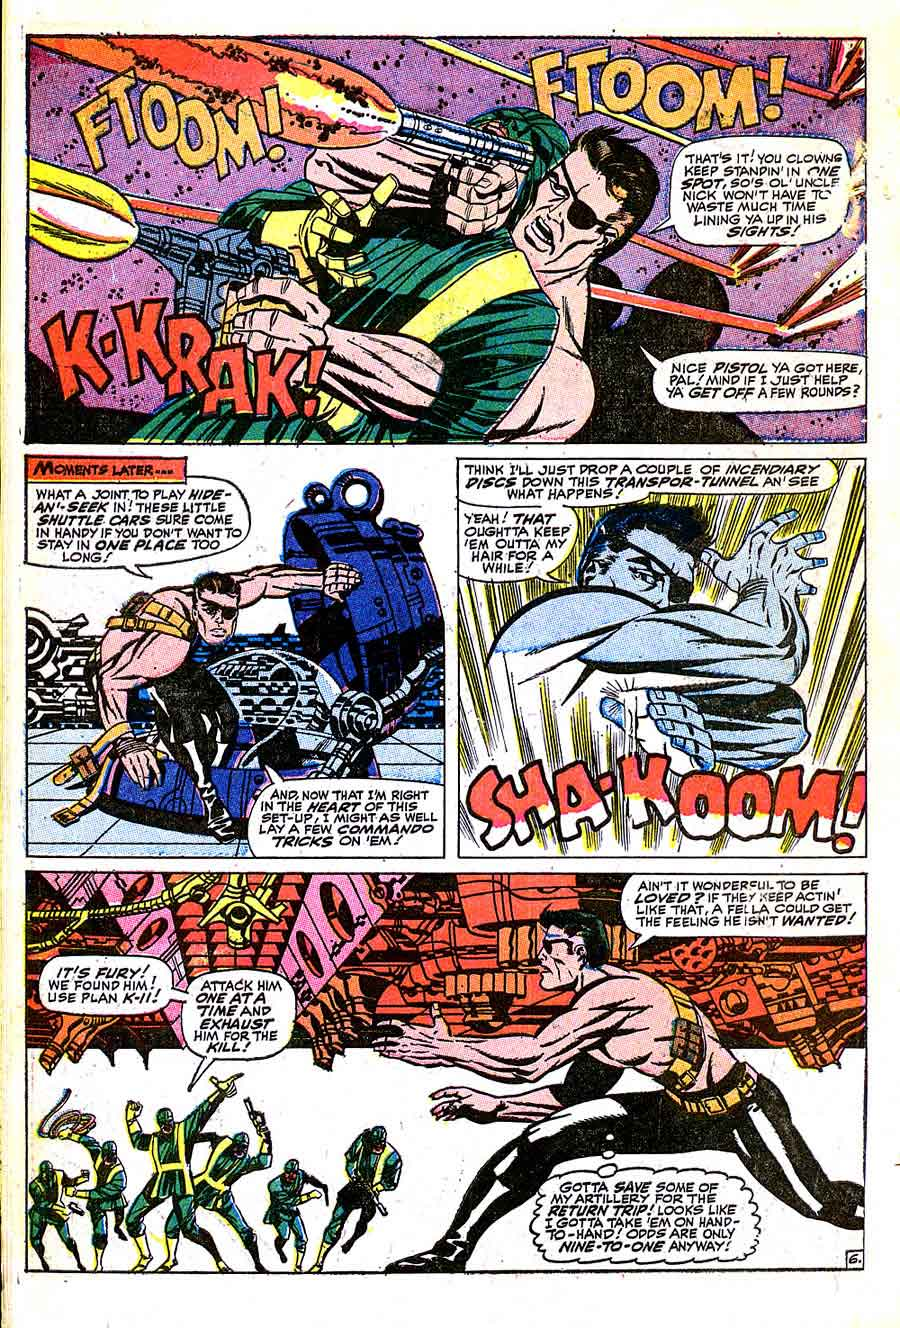 Strange Tales v1 #157 nick fury shield comic book page art by Jim Steranko